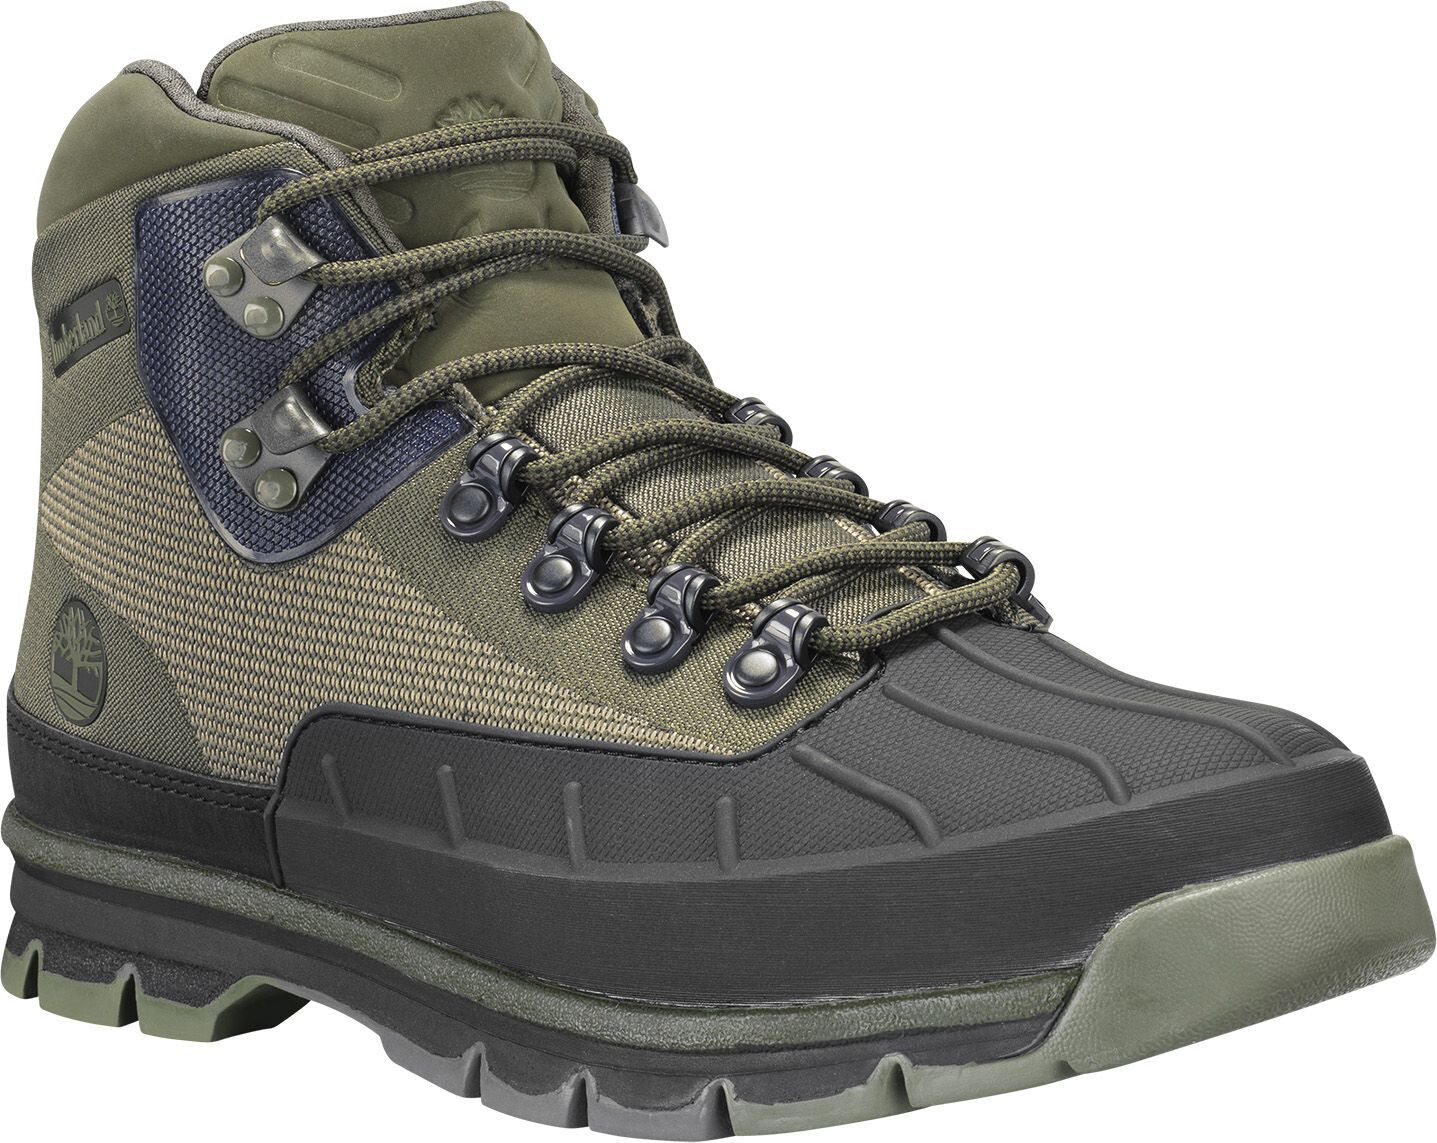 Timberland Euro Hiker Shell Toe Chaussures Jacquard Homme, dark green